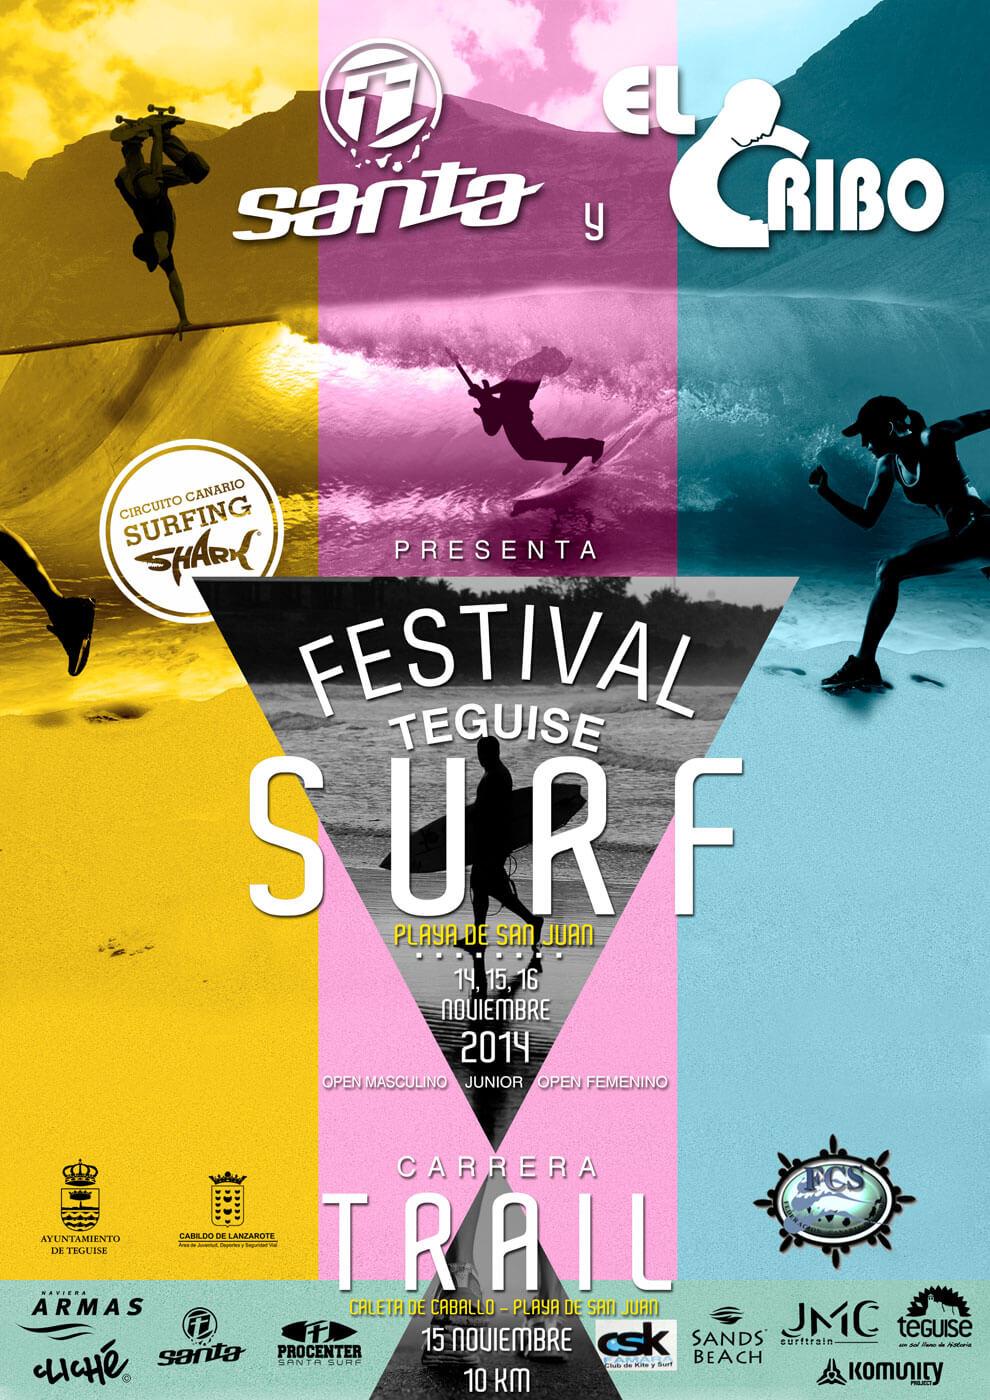 Teguise Surf Festival 2014